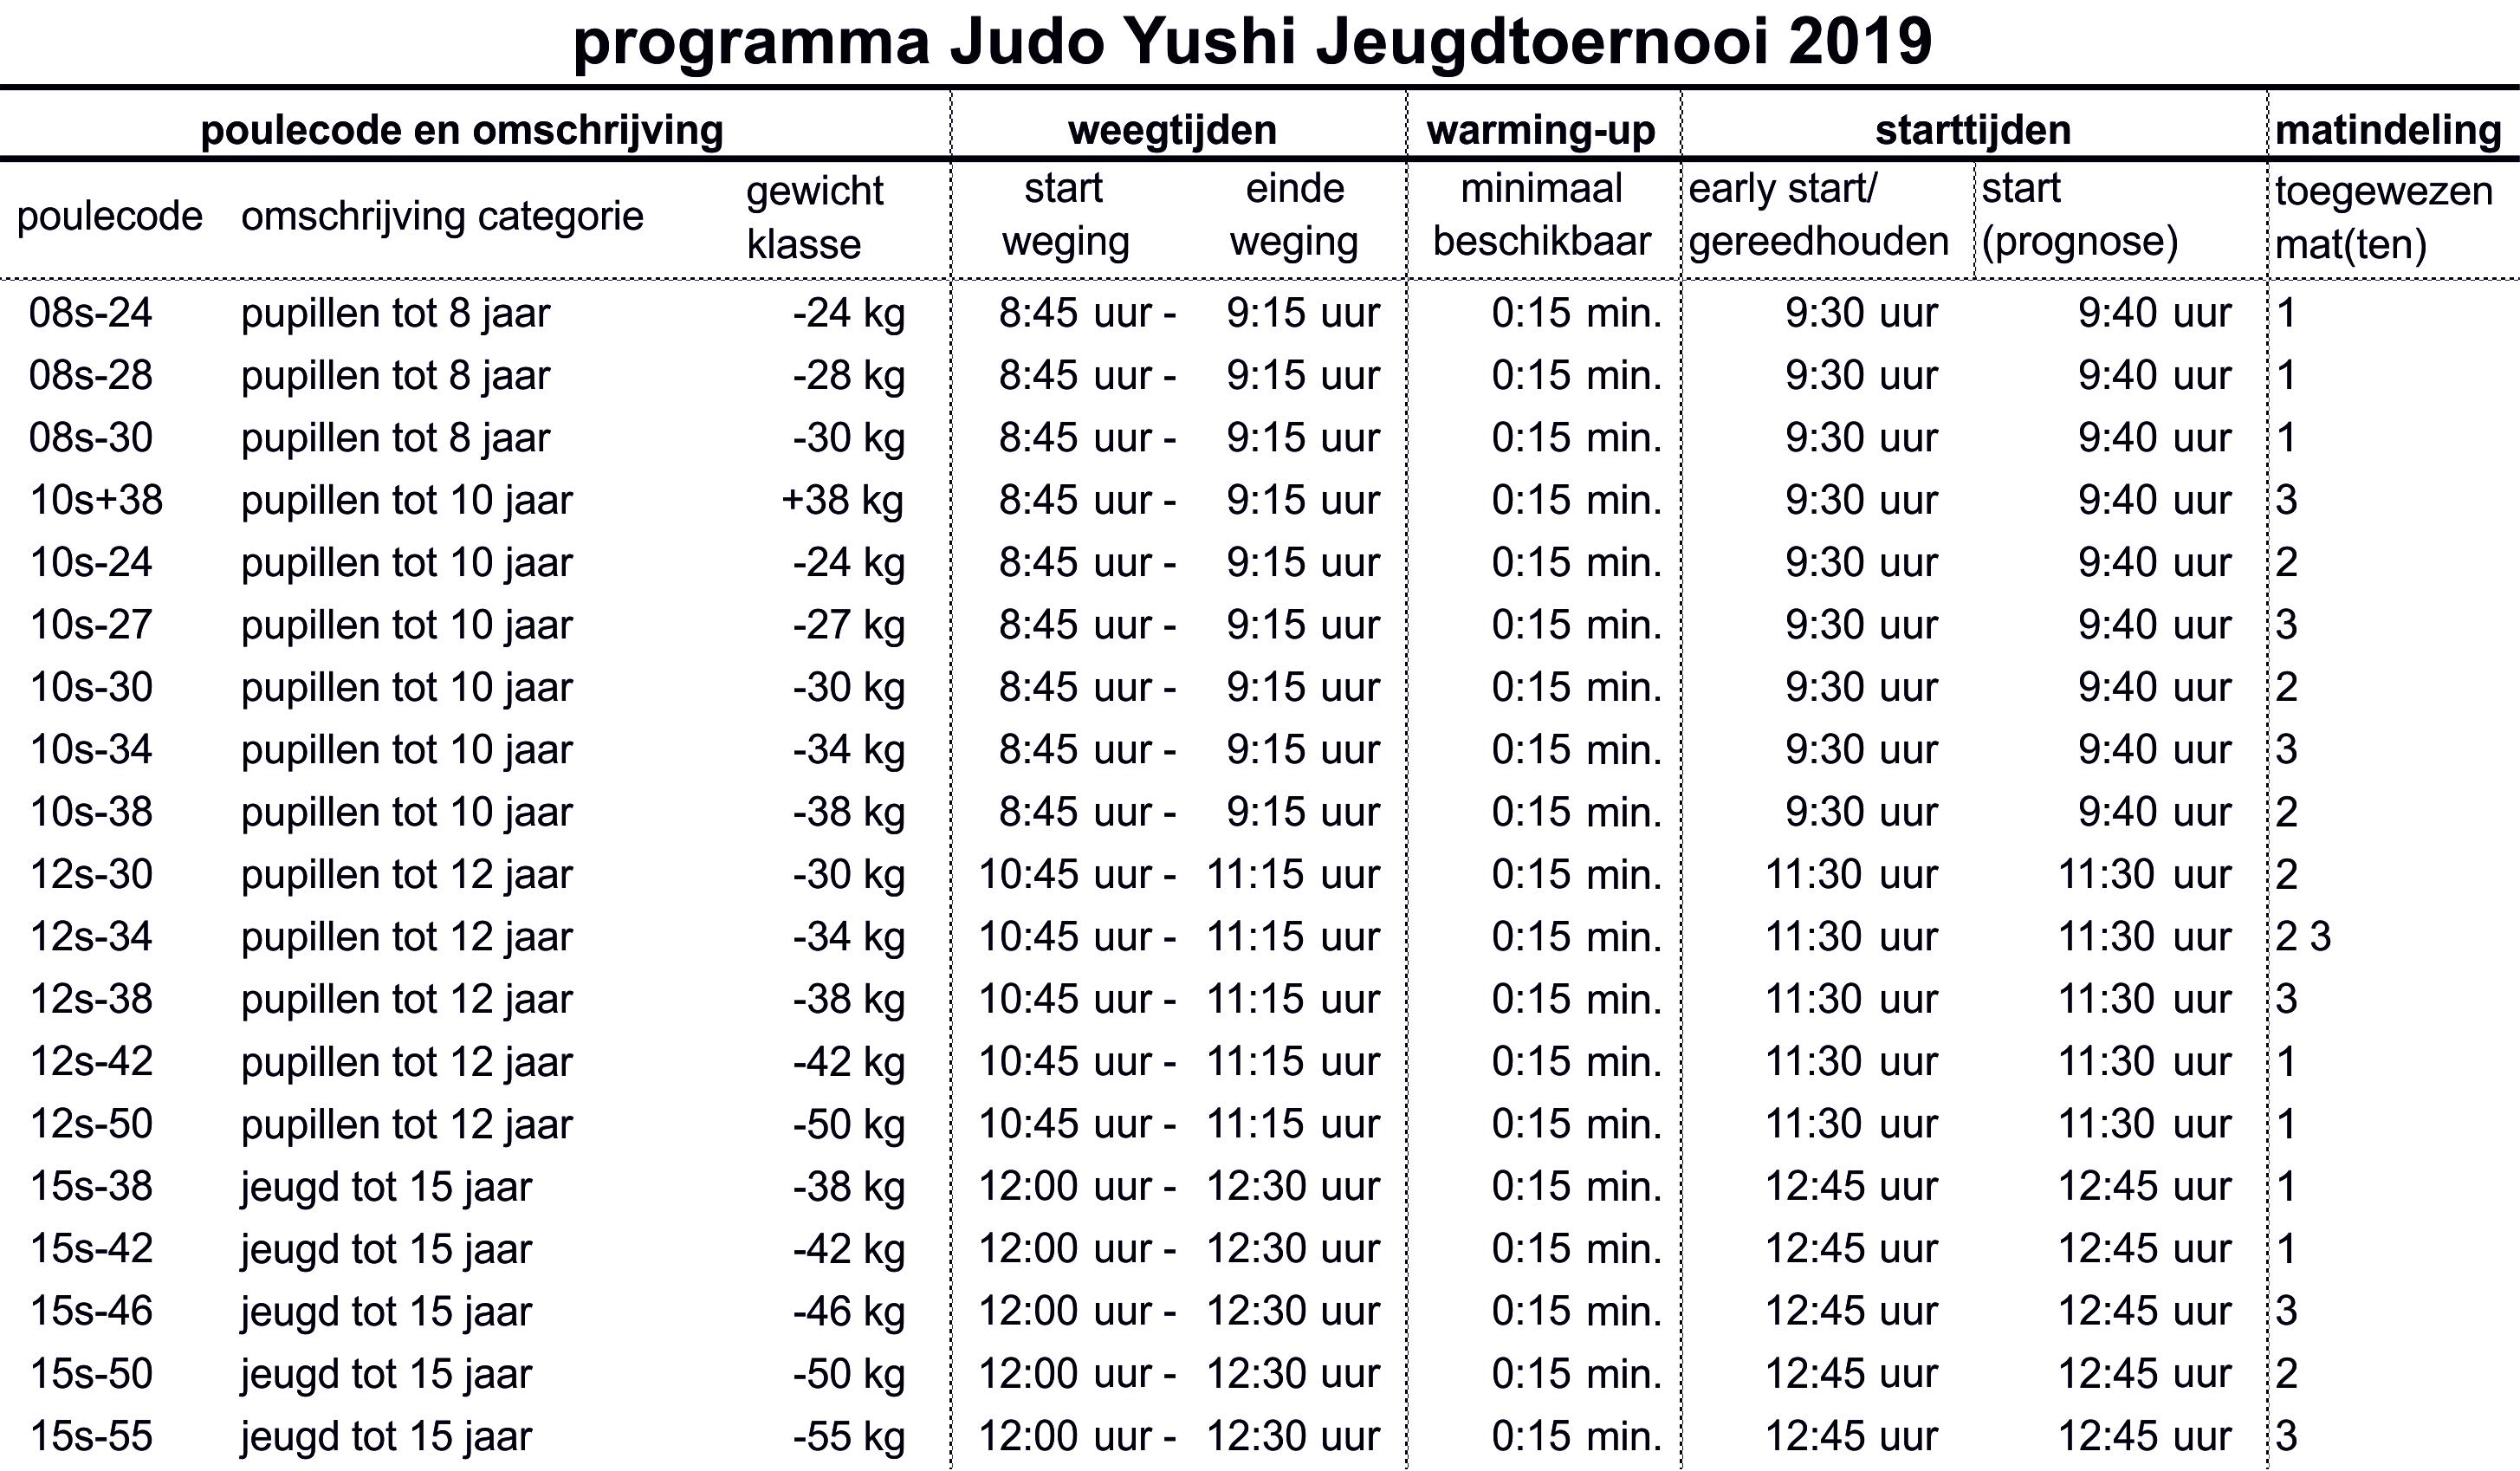 Judo Yushi jeugdtoernooi 2019 programma